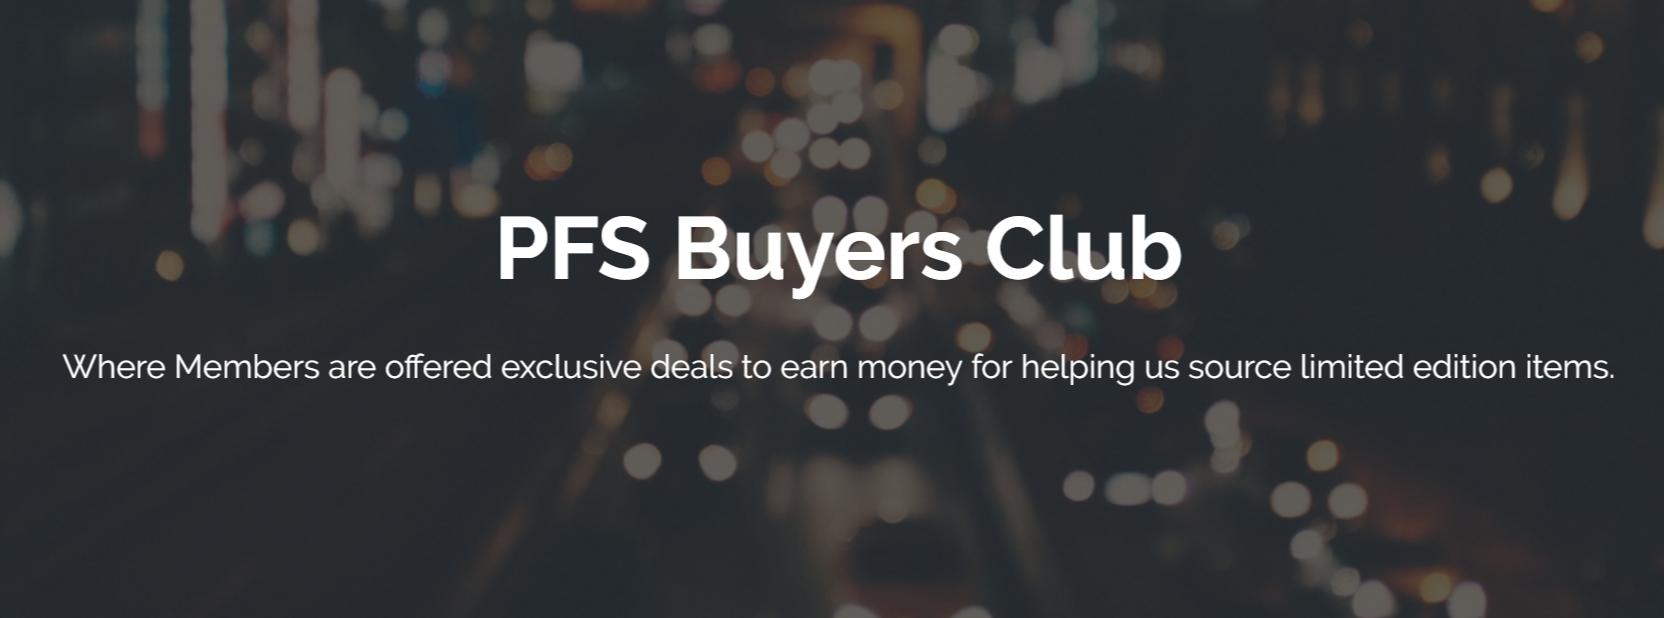 pfs buyers club coin